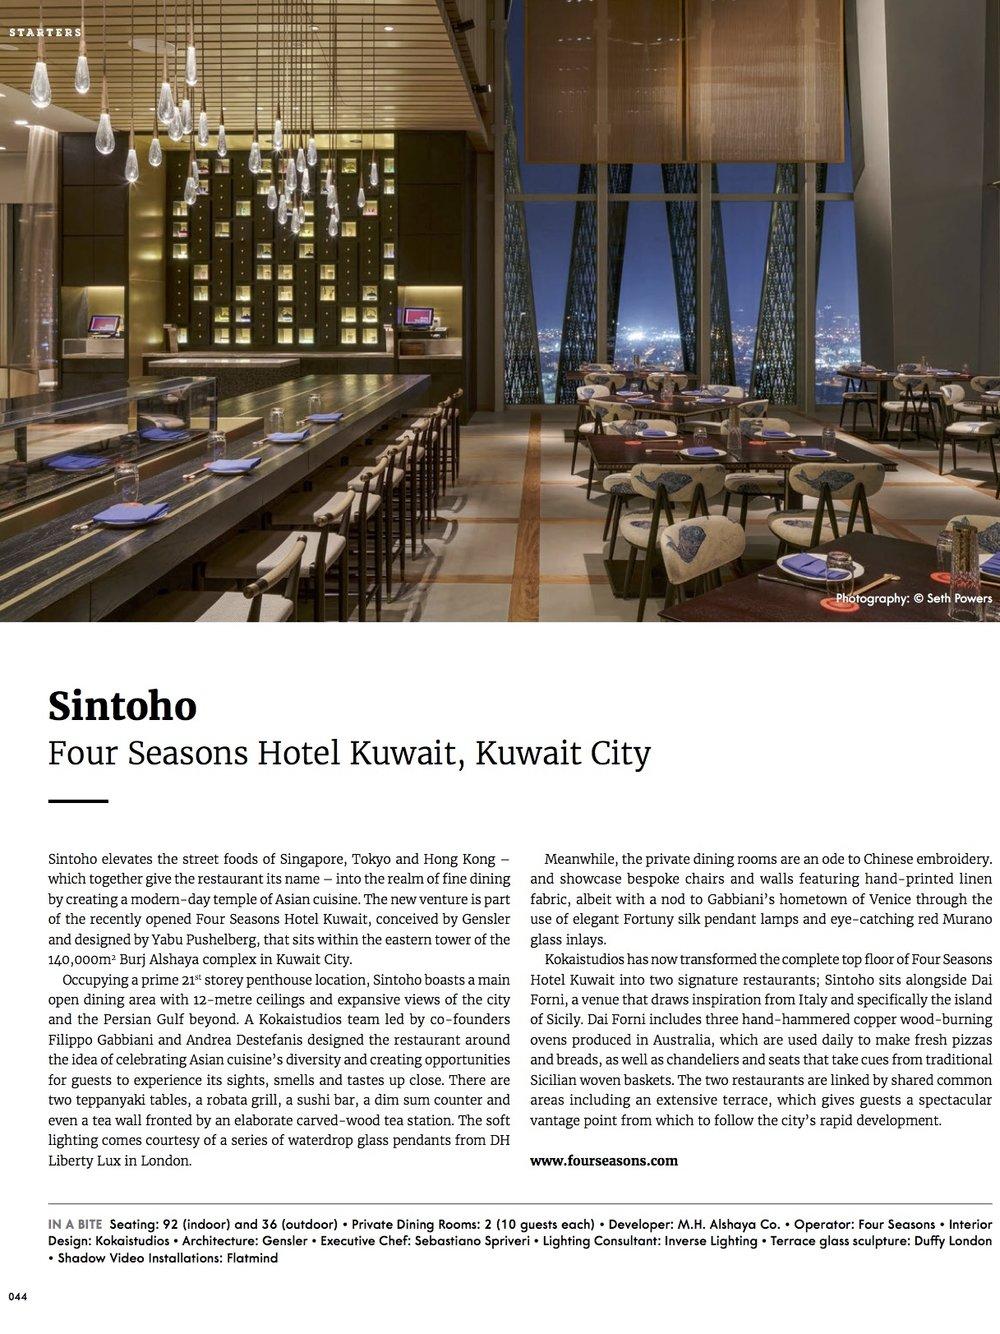 Supper | Issue 11 July 2018 - Sintoho at Four Seasons Hotel Kuwait | Kokaistudios